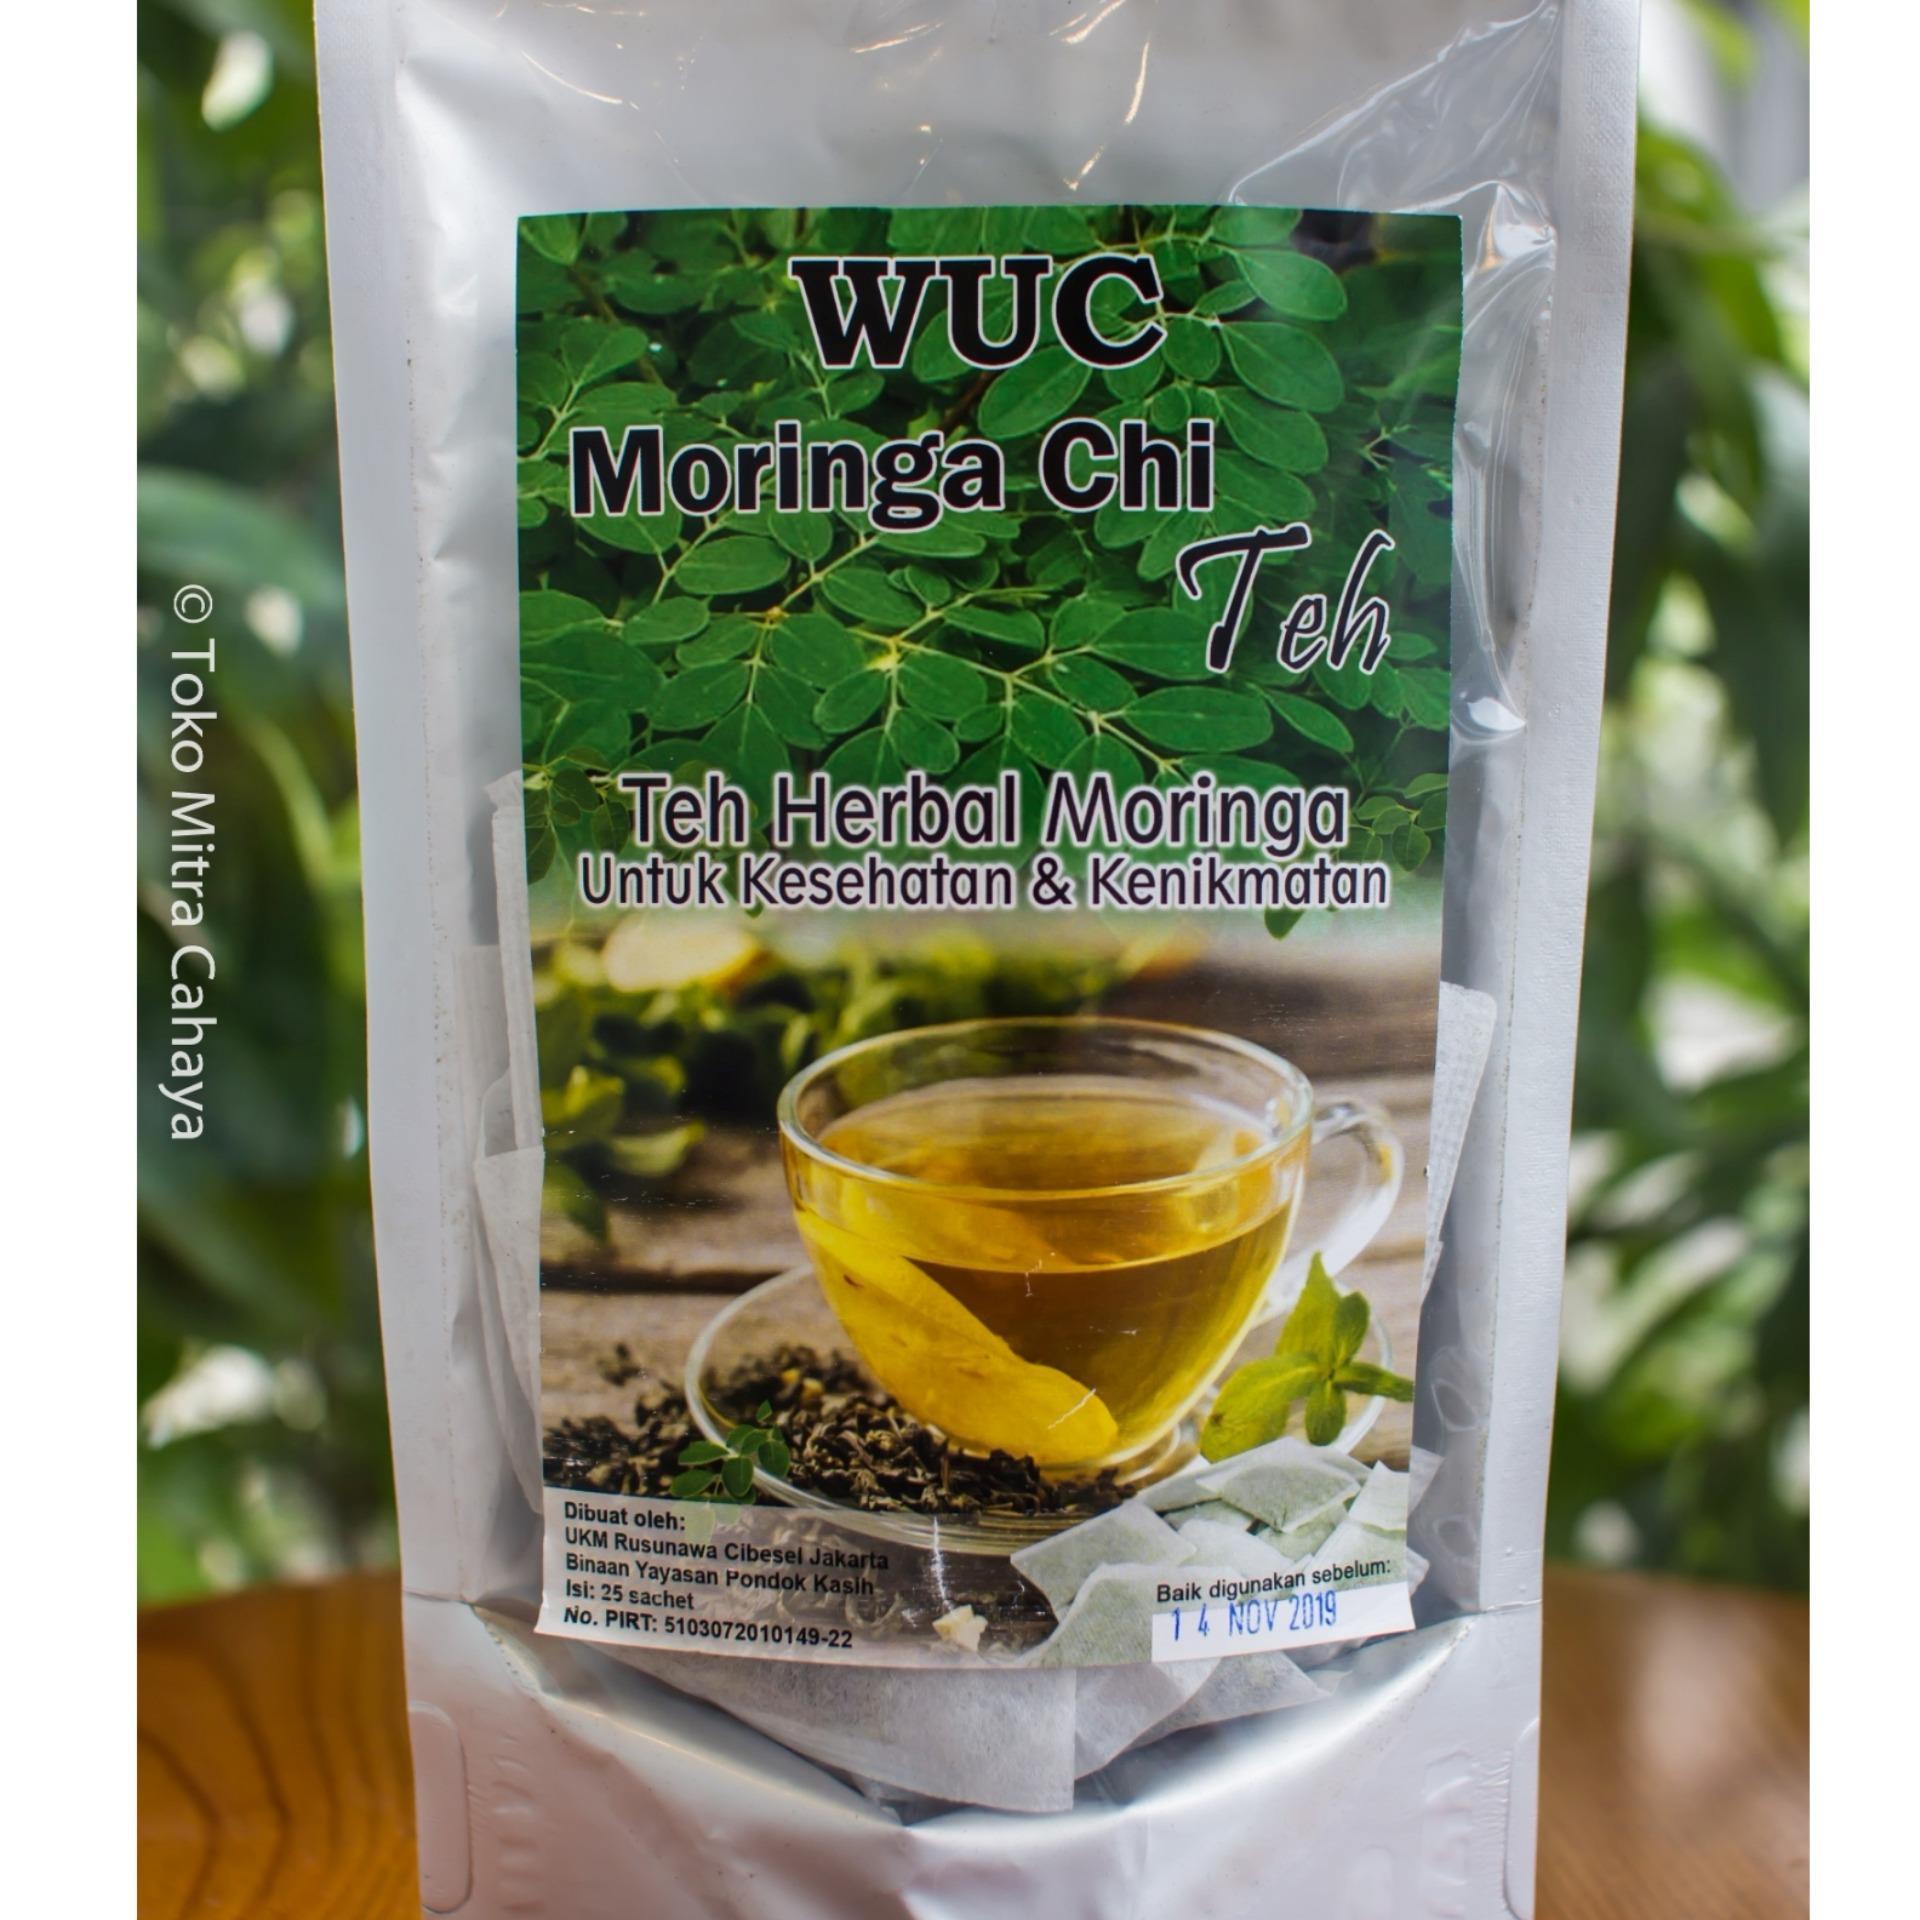 Toko Teh Herbal Moringa Chi Lengkap Dki Jakarta